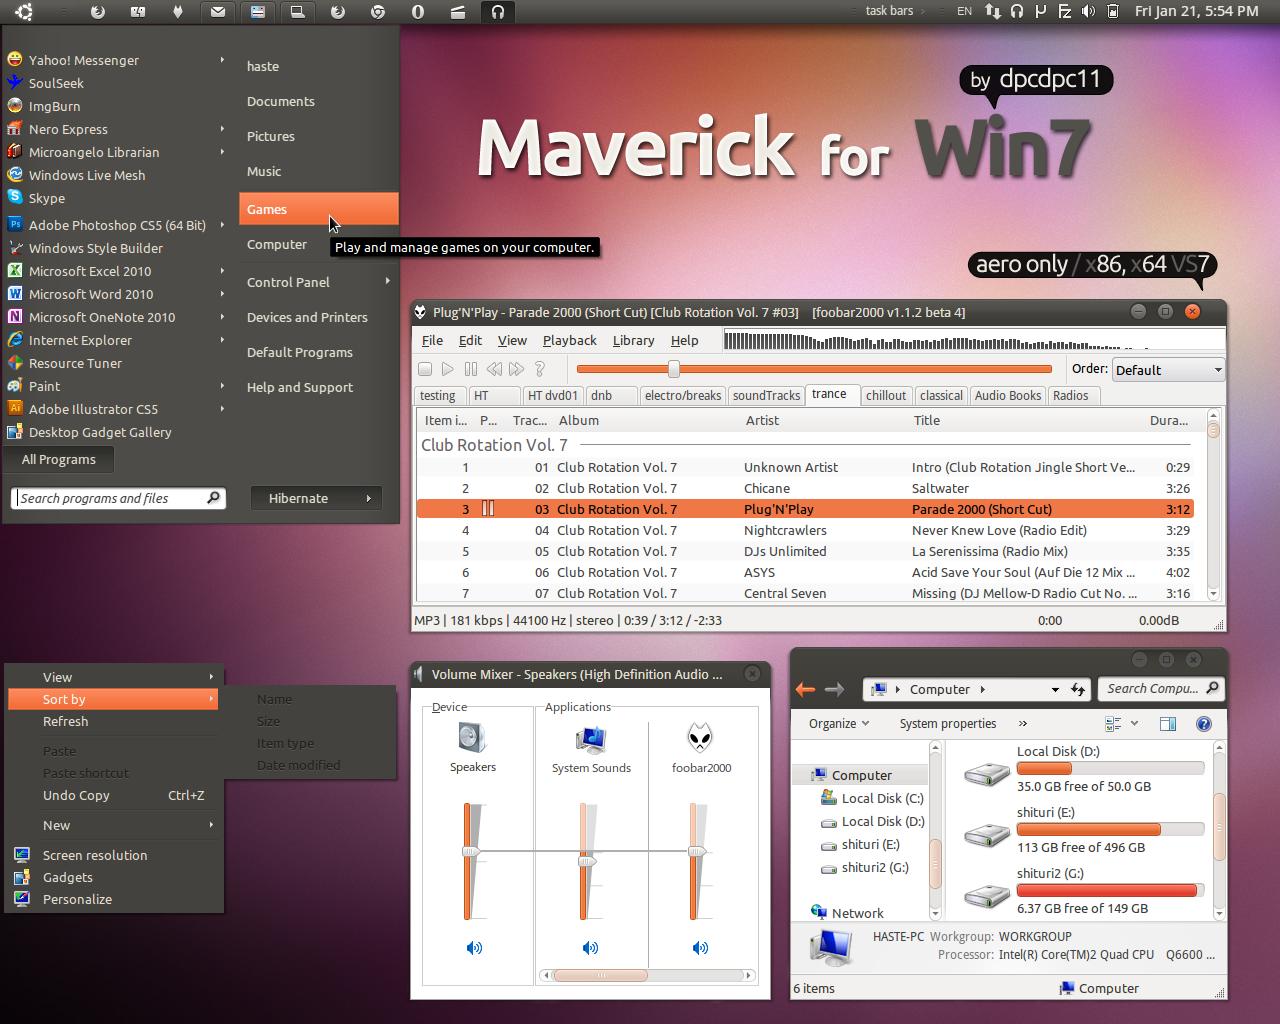 Maverick for Win7